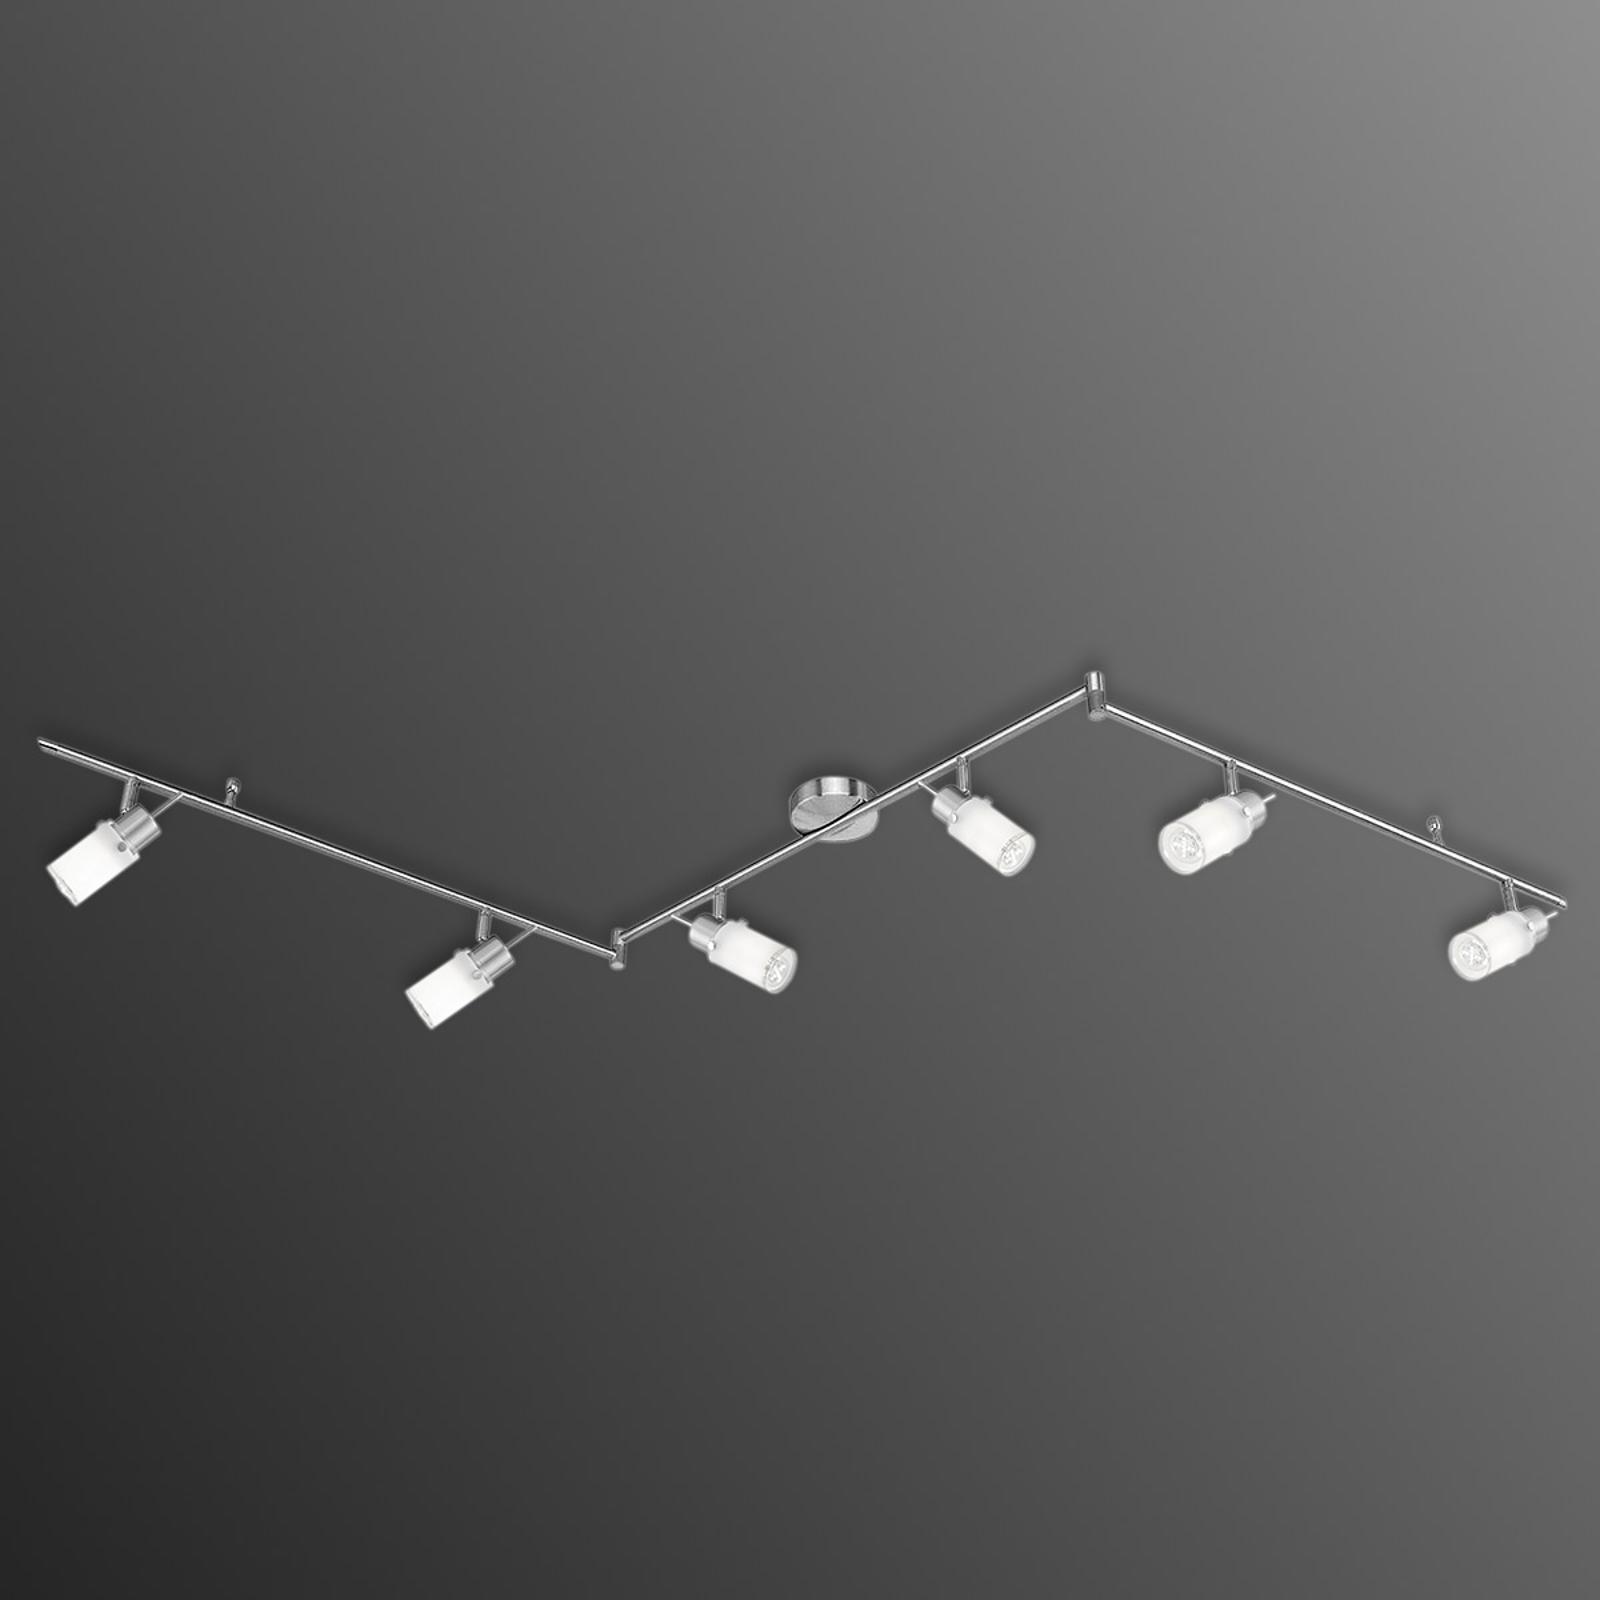 Trójramienna lampa sufitowa LED MAX, 6-punktowa